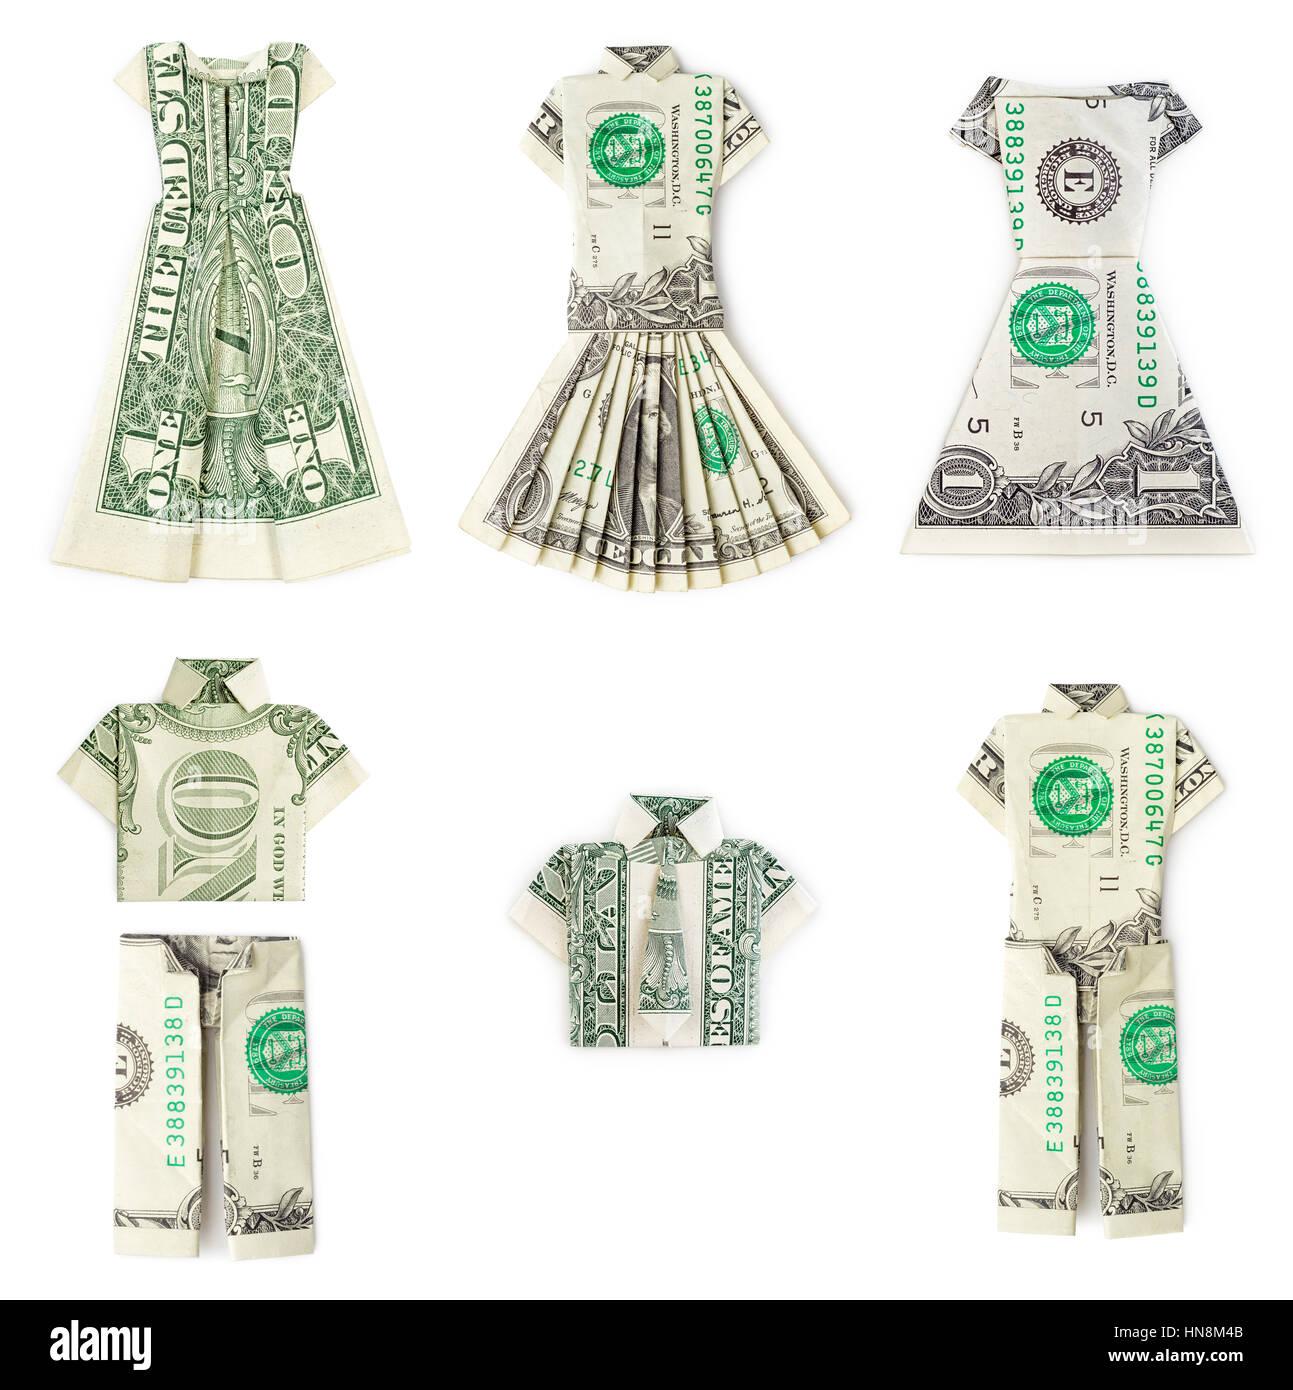 82 Money Origami Shirt Photos - Free & Royalty-Free Stock Photos ... | 1390x1293